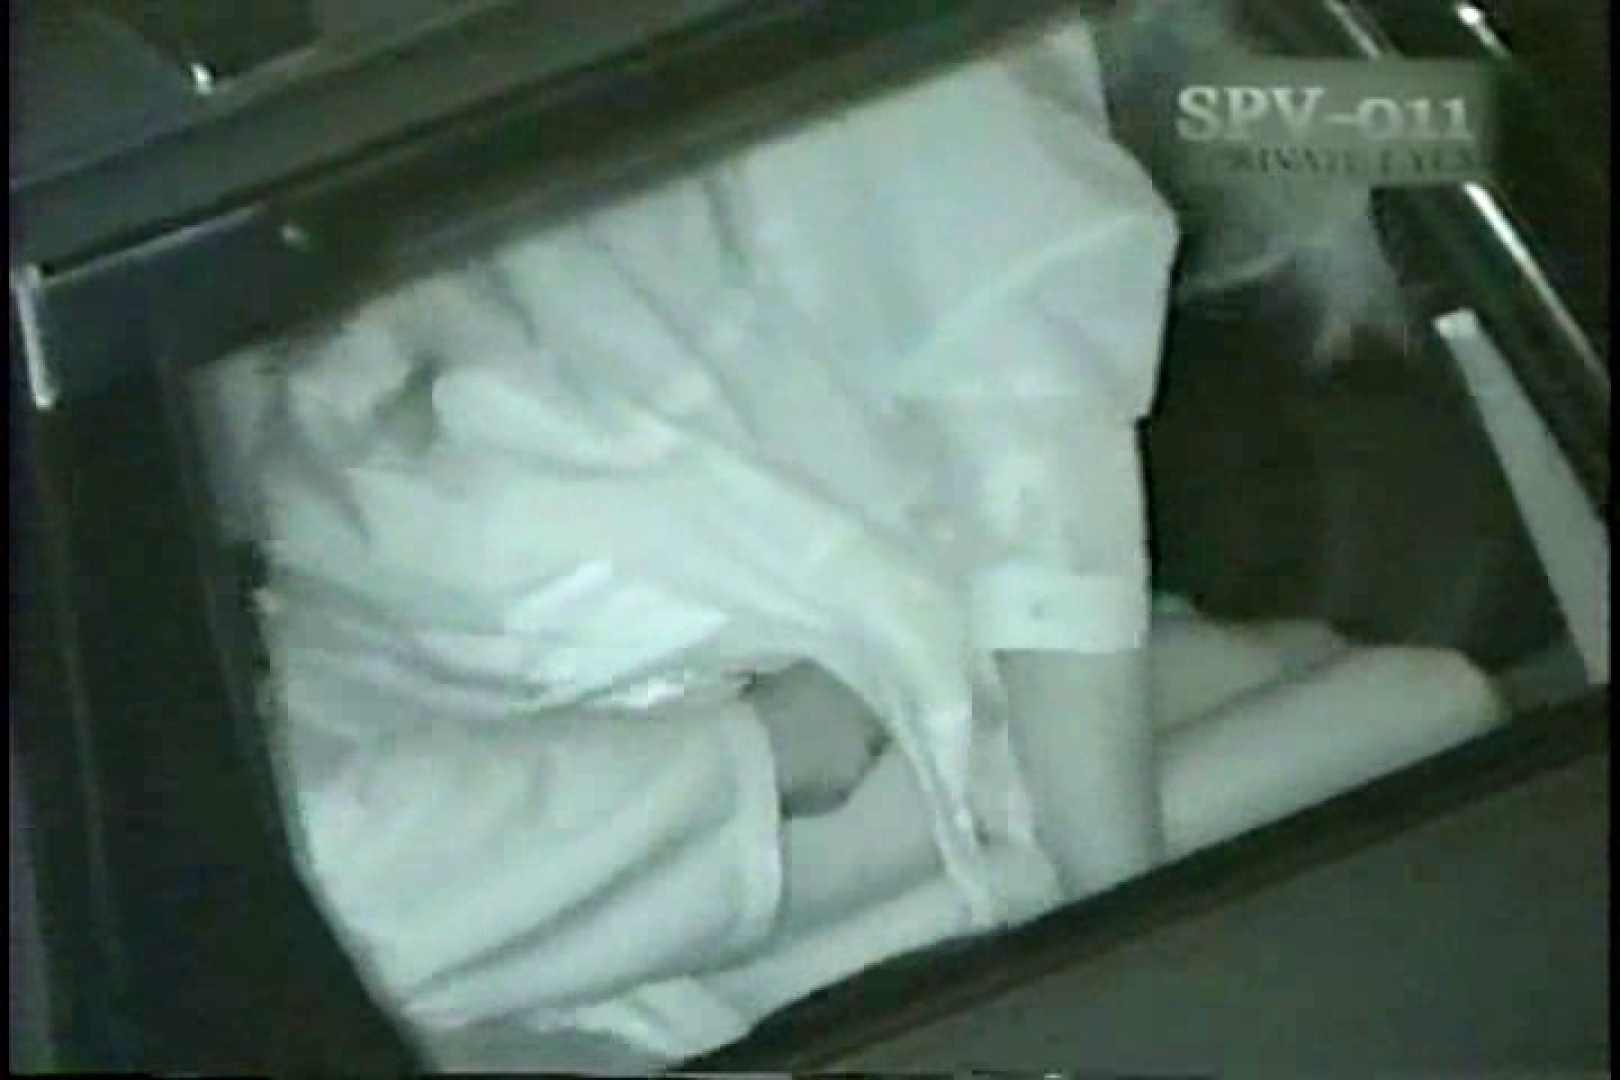 高画質版!SPD-011 盗撮 カーセックス黙示録 (VHS) 高画質 盗撮画像 107PIX 32